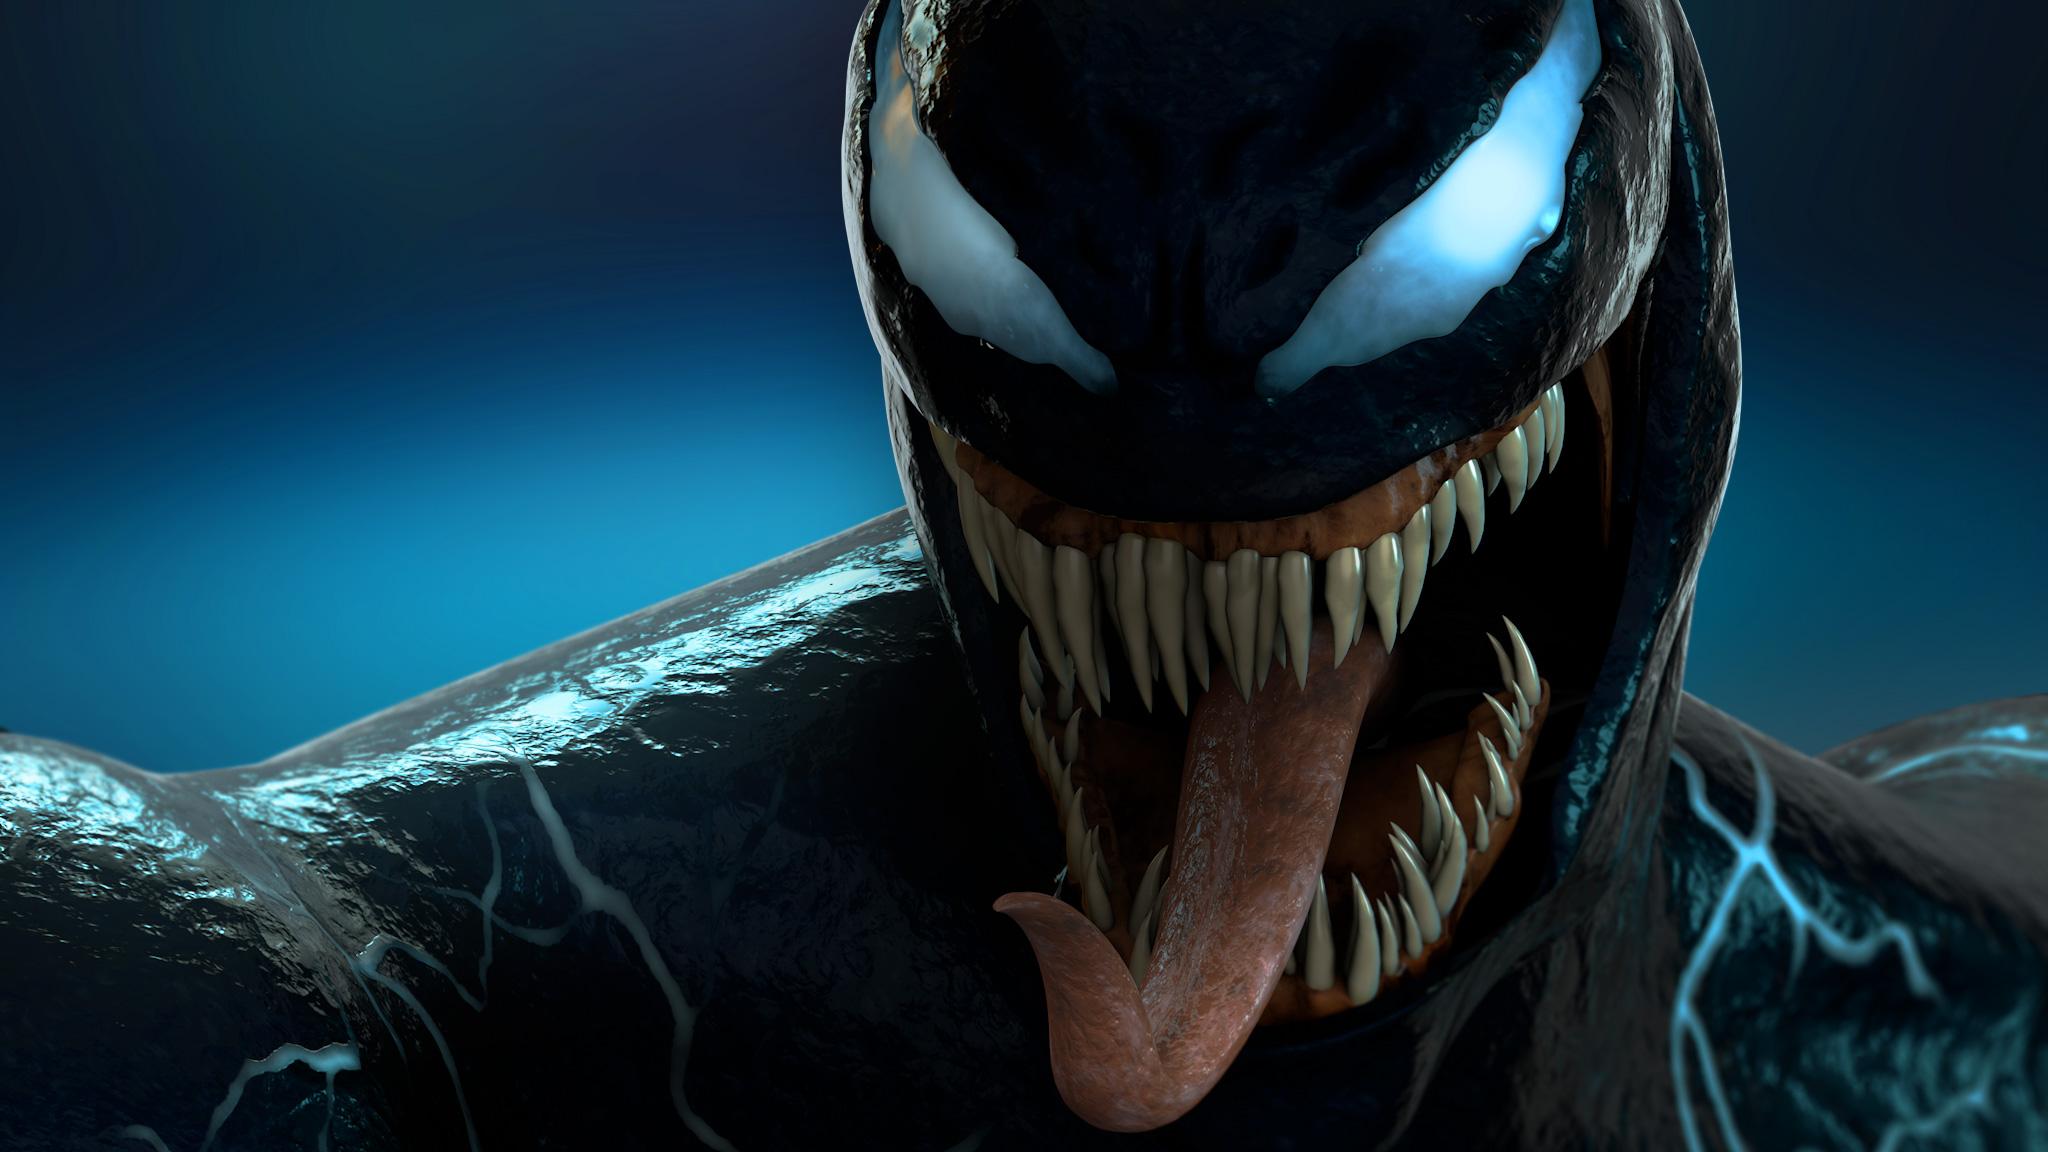 Venom 3d Digital Art Hd Superheroes 4k Wallpapers Images